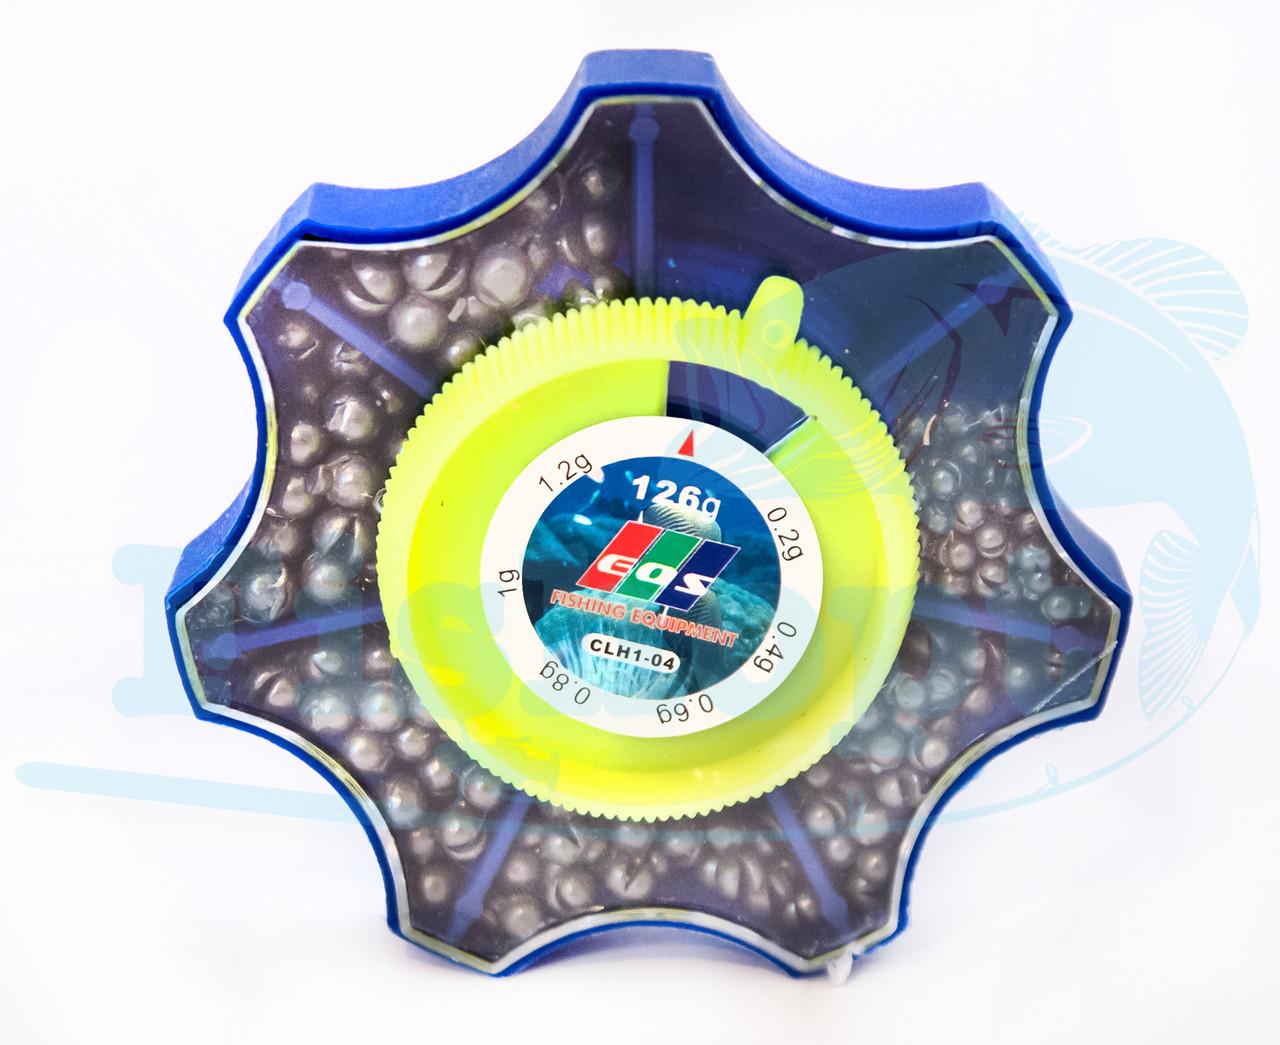 Набор грузил EOS CLH1-04